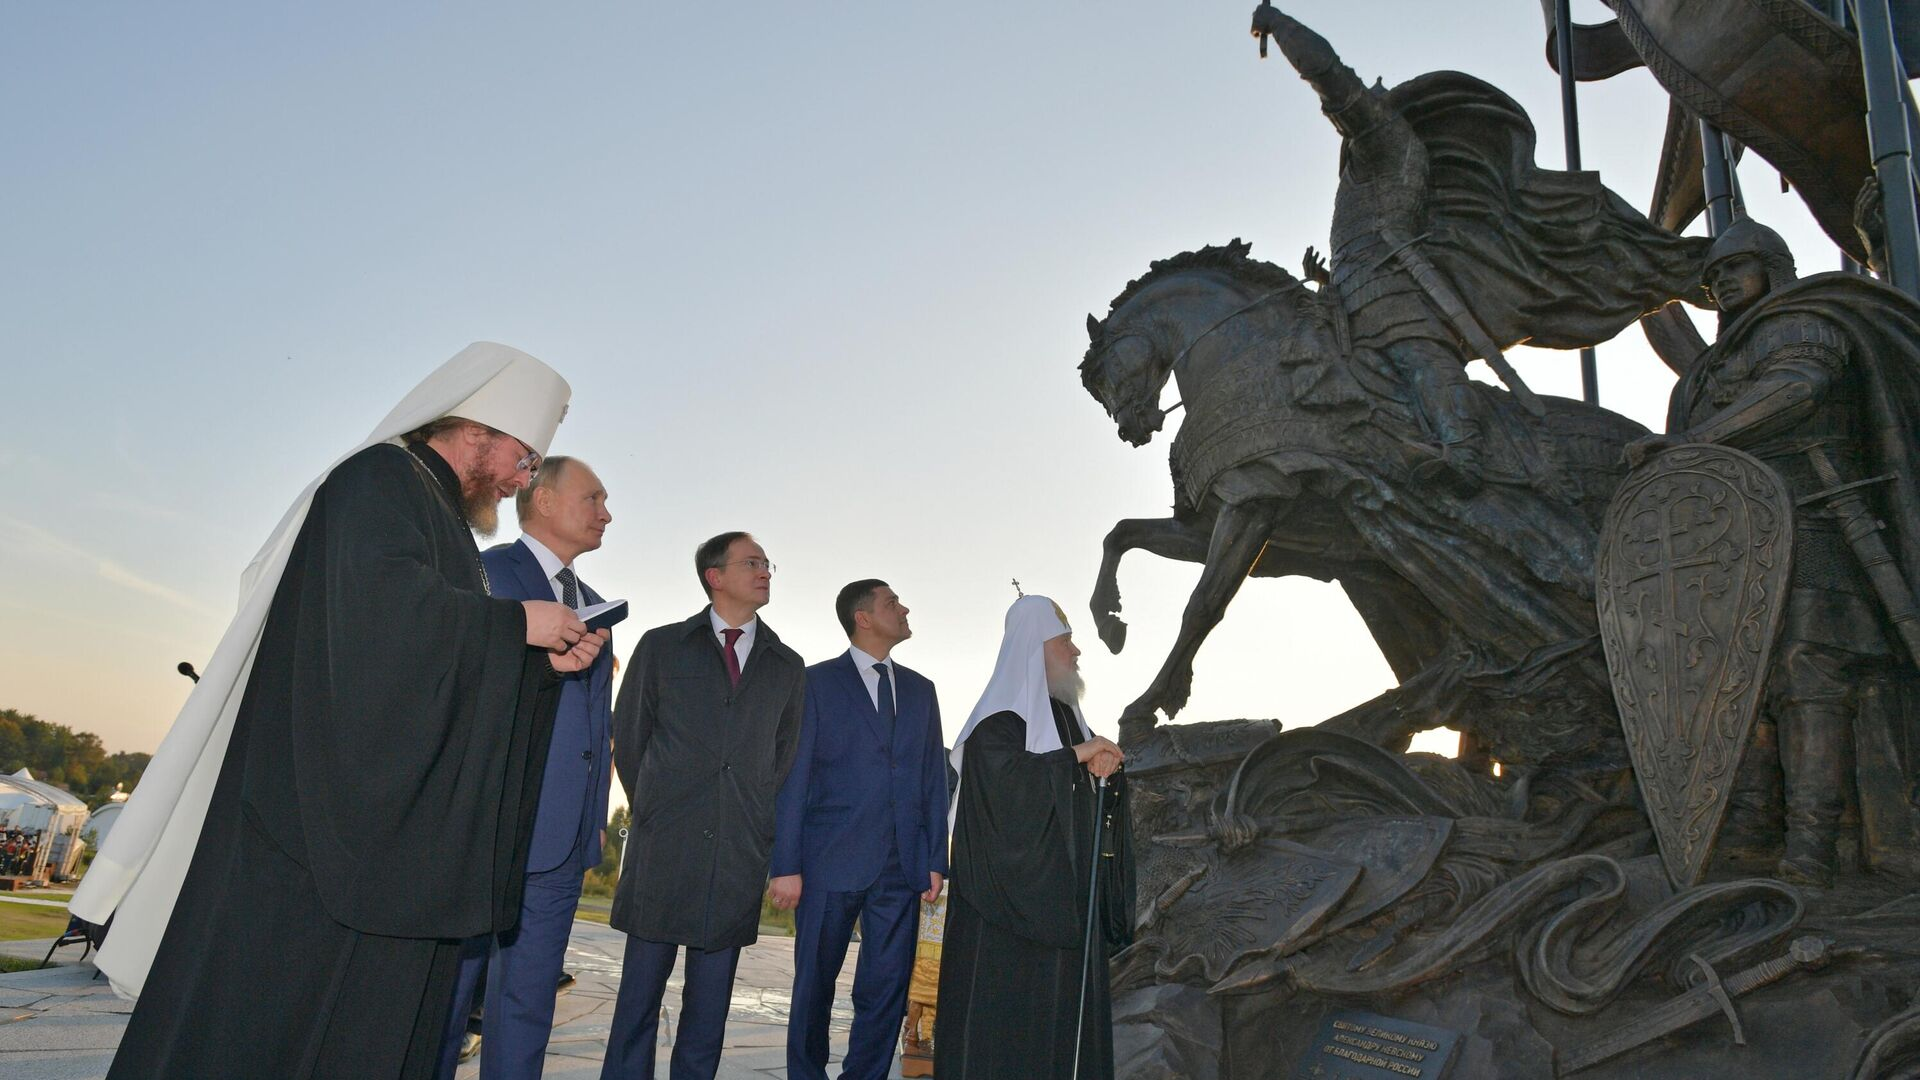 Otvaranje spomenika Aleksandru Nevskom i njegovoj družini na Čudskom jezeru - Sputnik Srbija, 1920, 11.09.2021